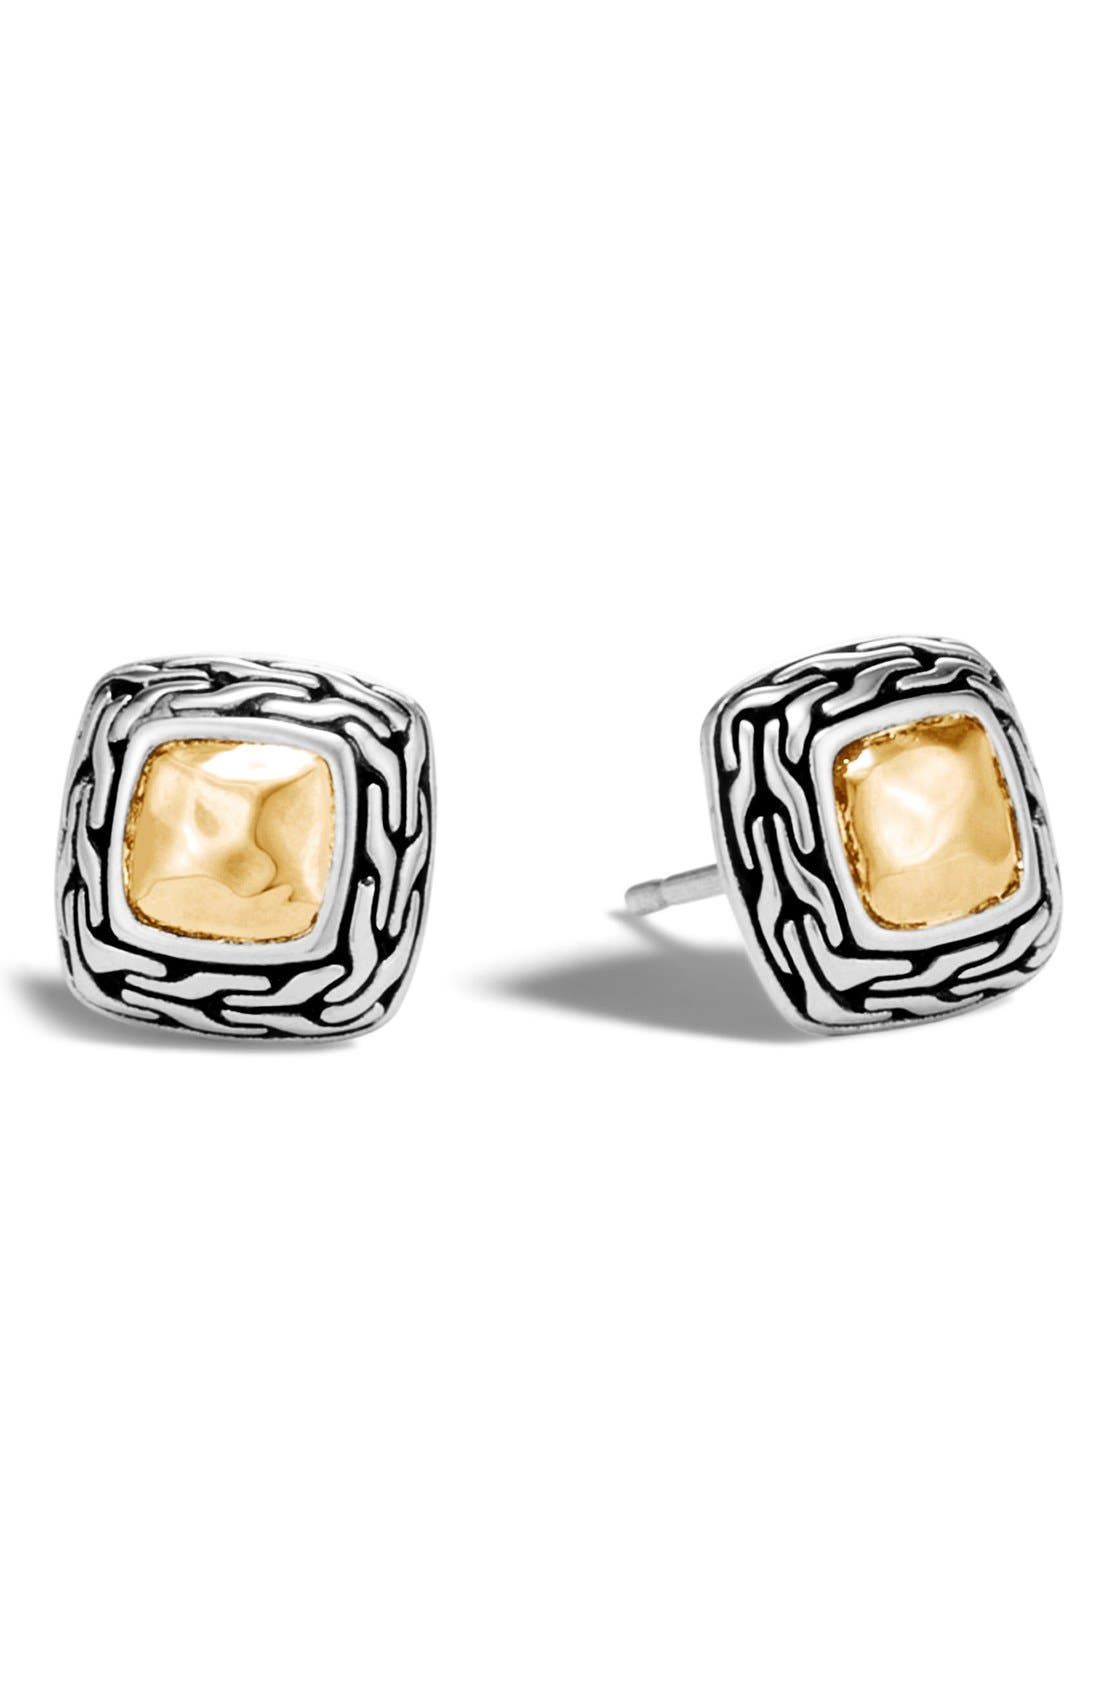 Main Image - John Hardy Heritage Stud Earrings